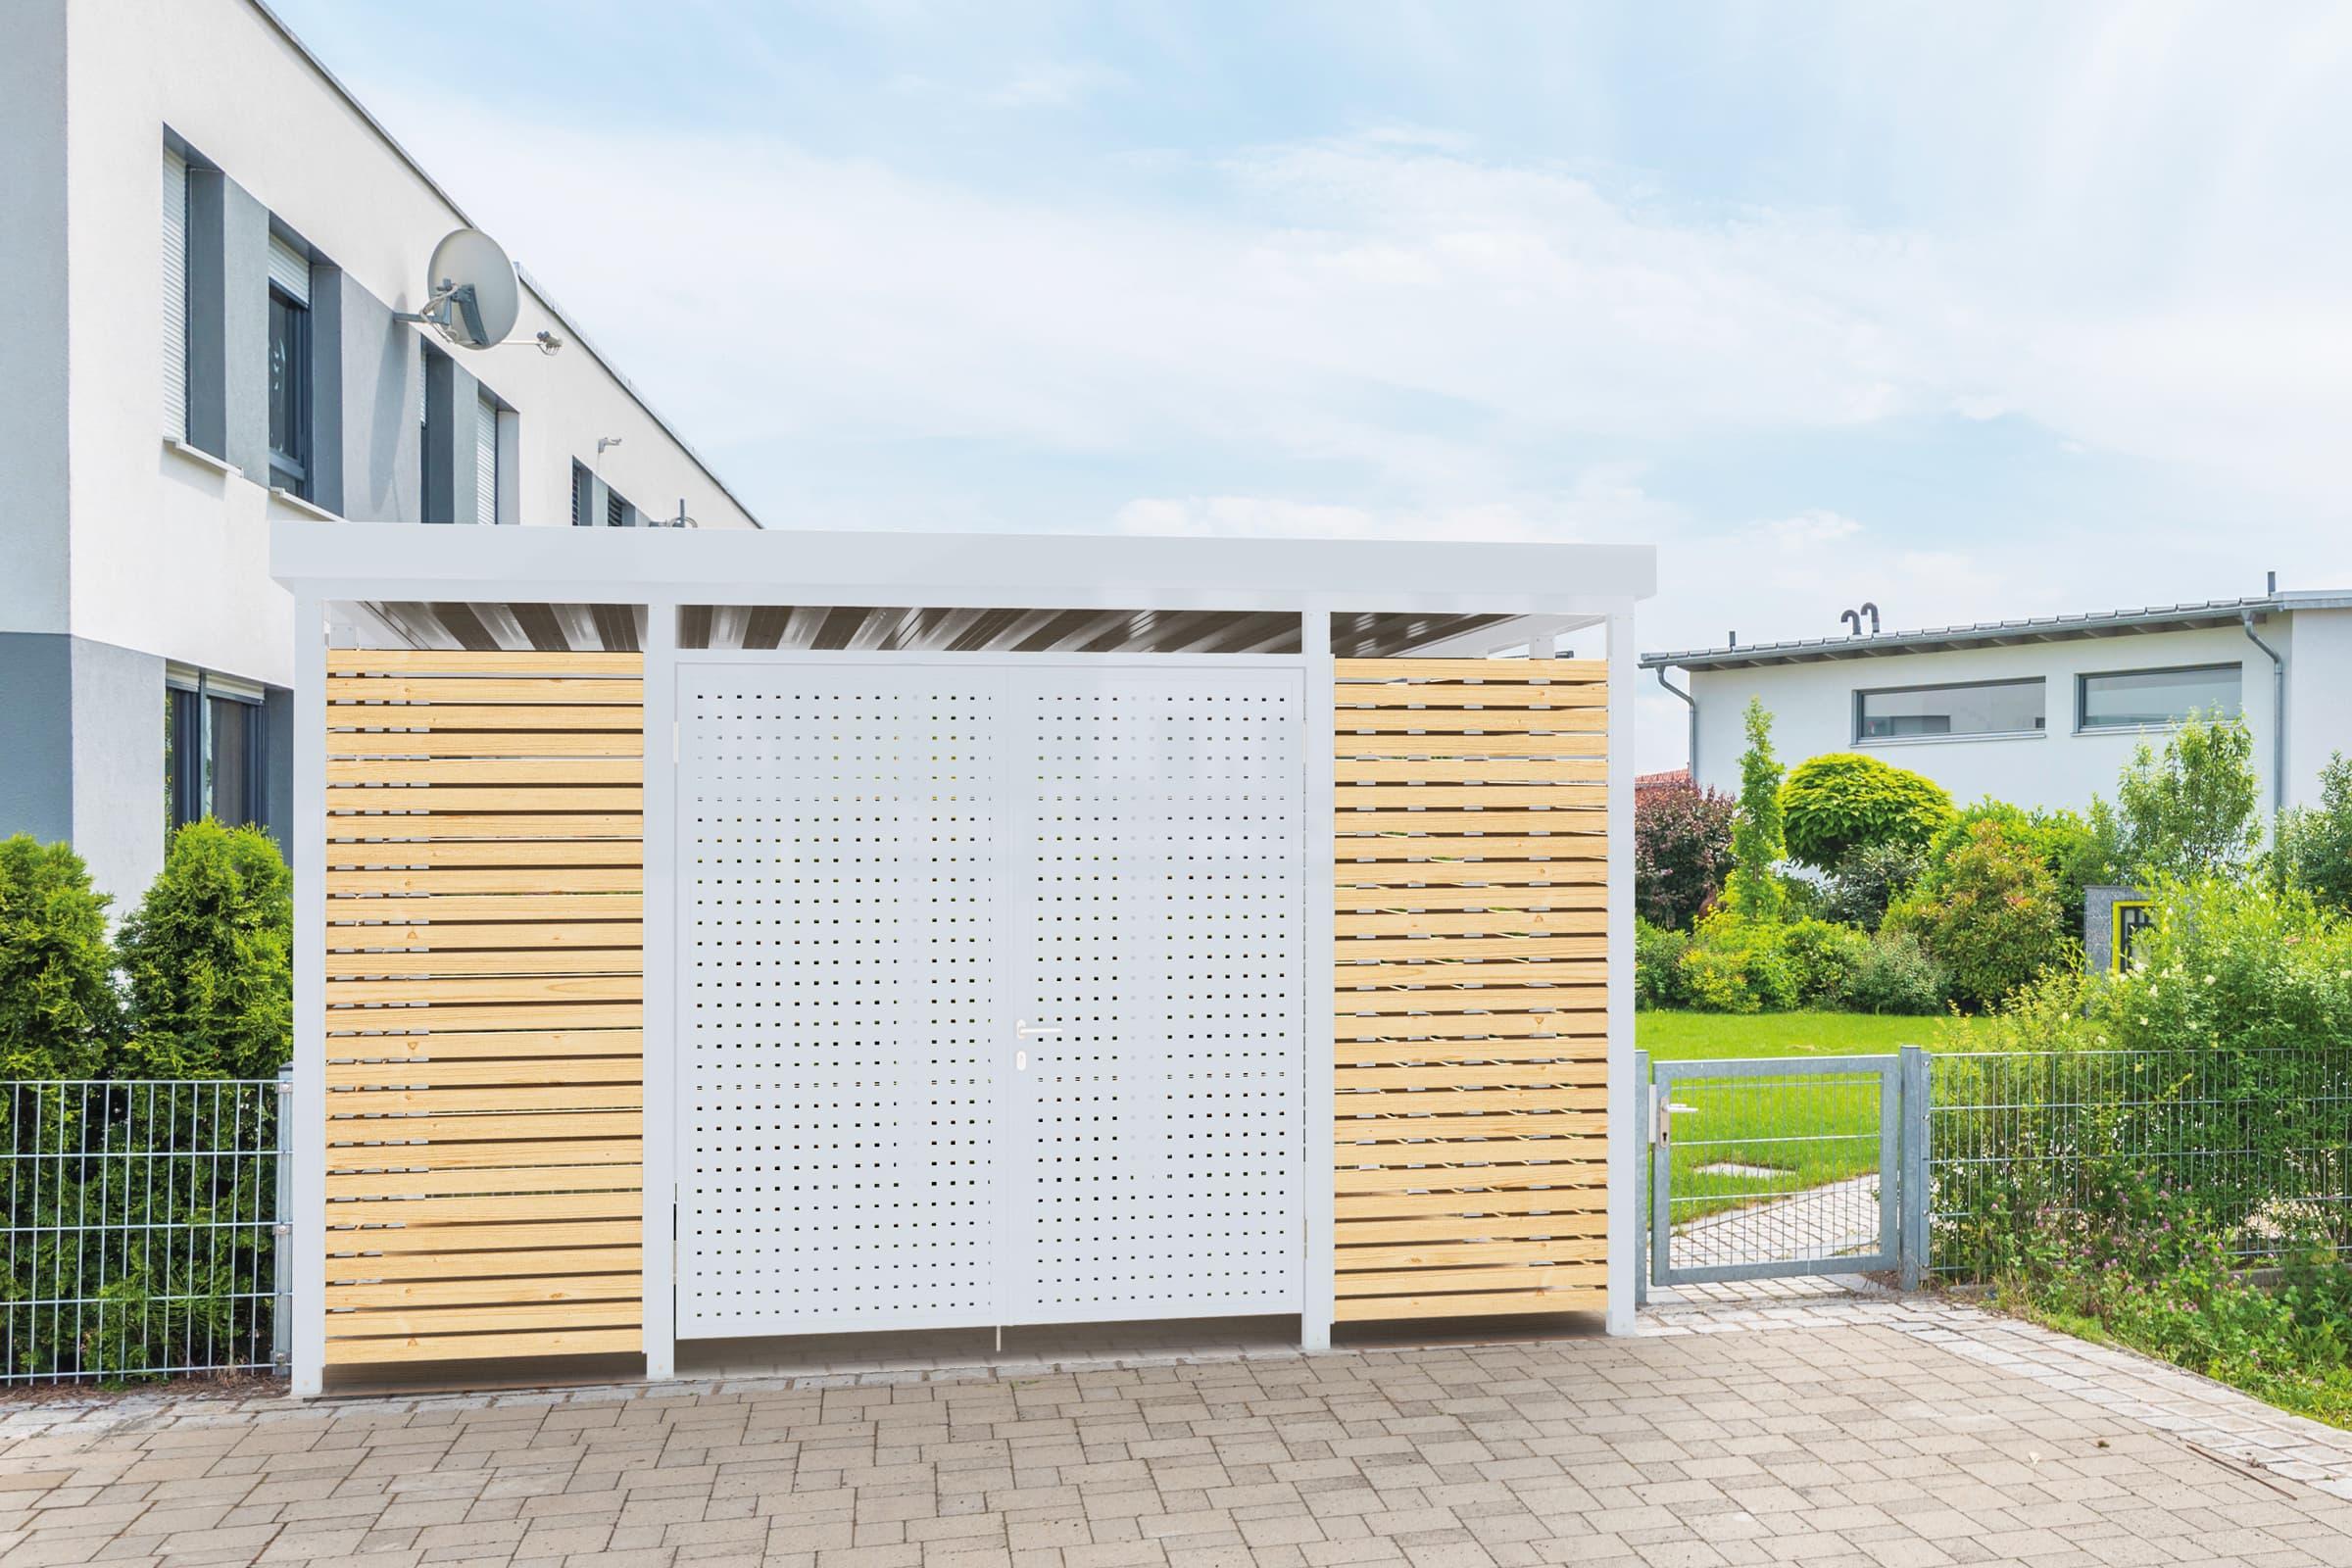 Einhausung Modul-Bauweise Holz QLB